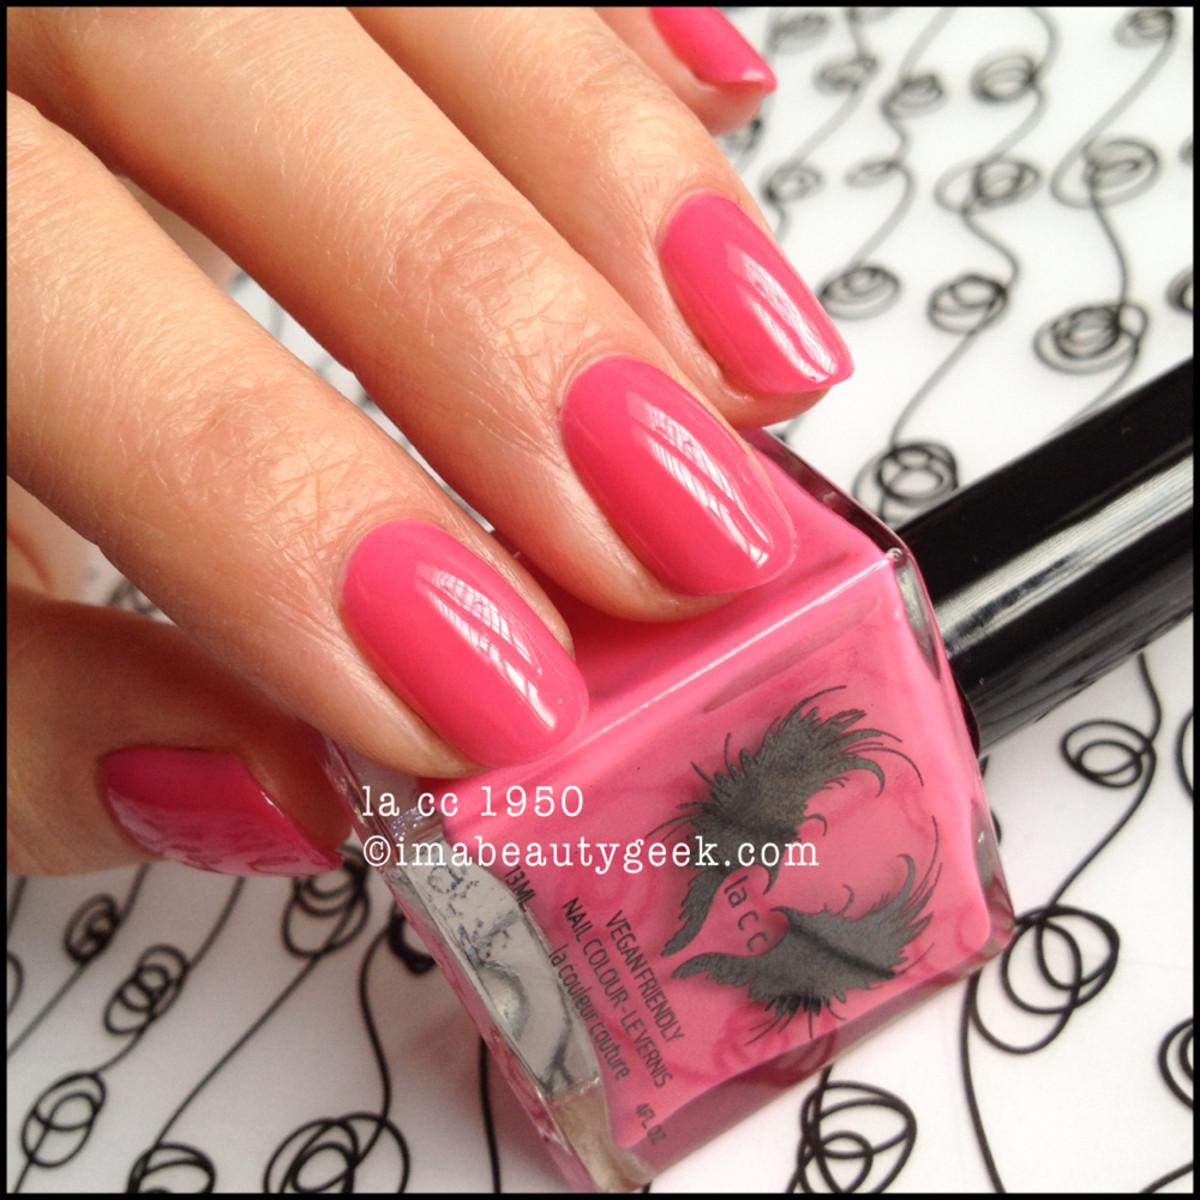 lacc polish 1950 Beautygeeks